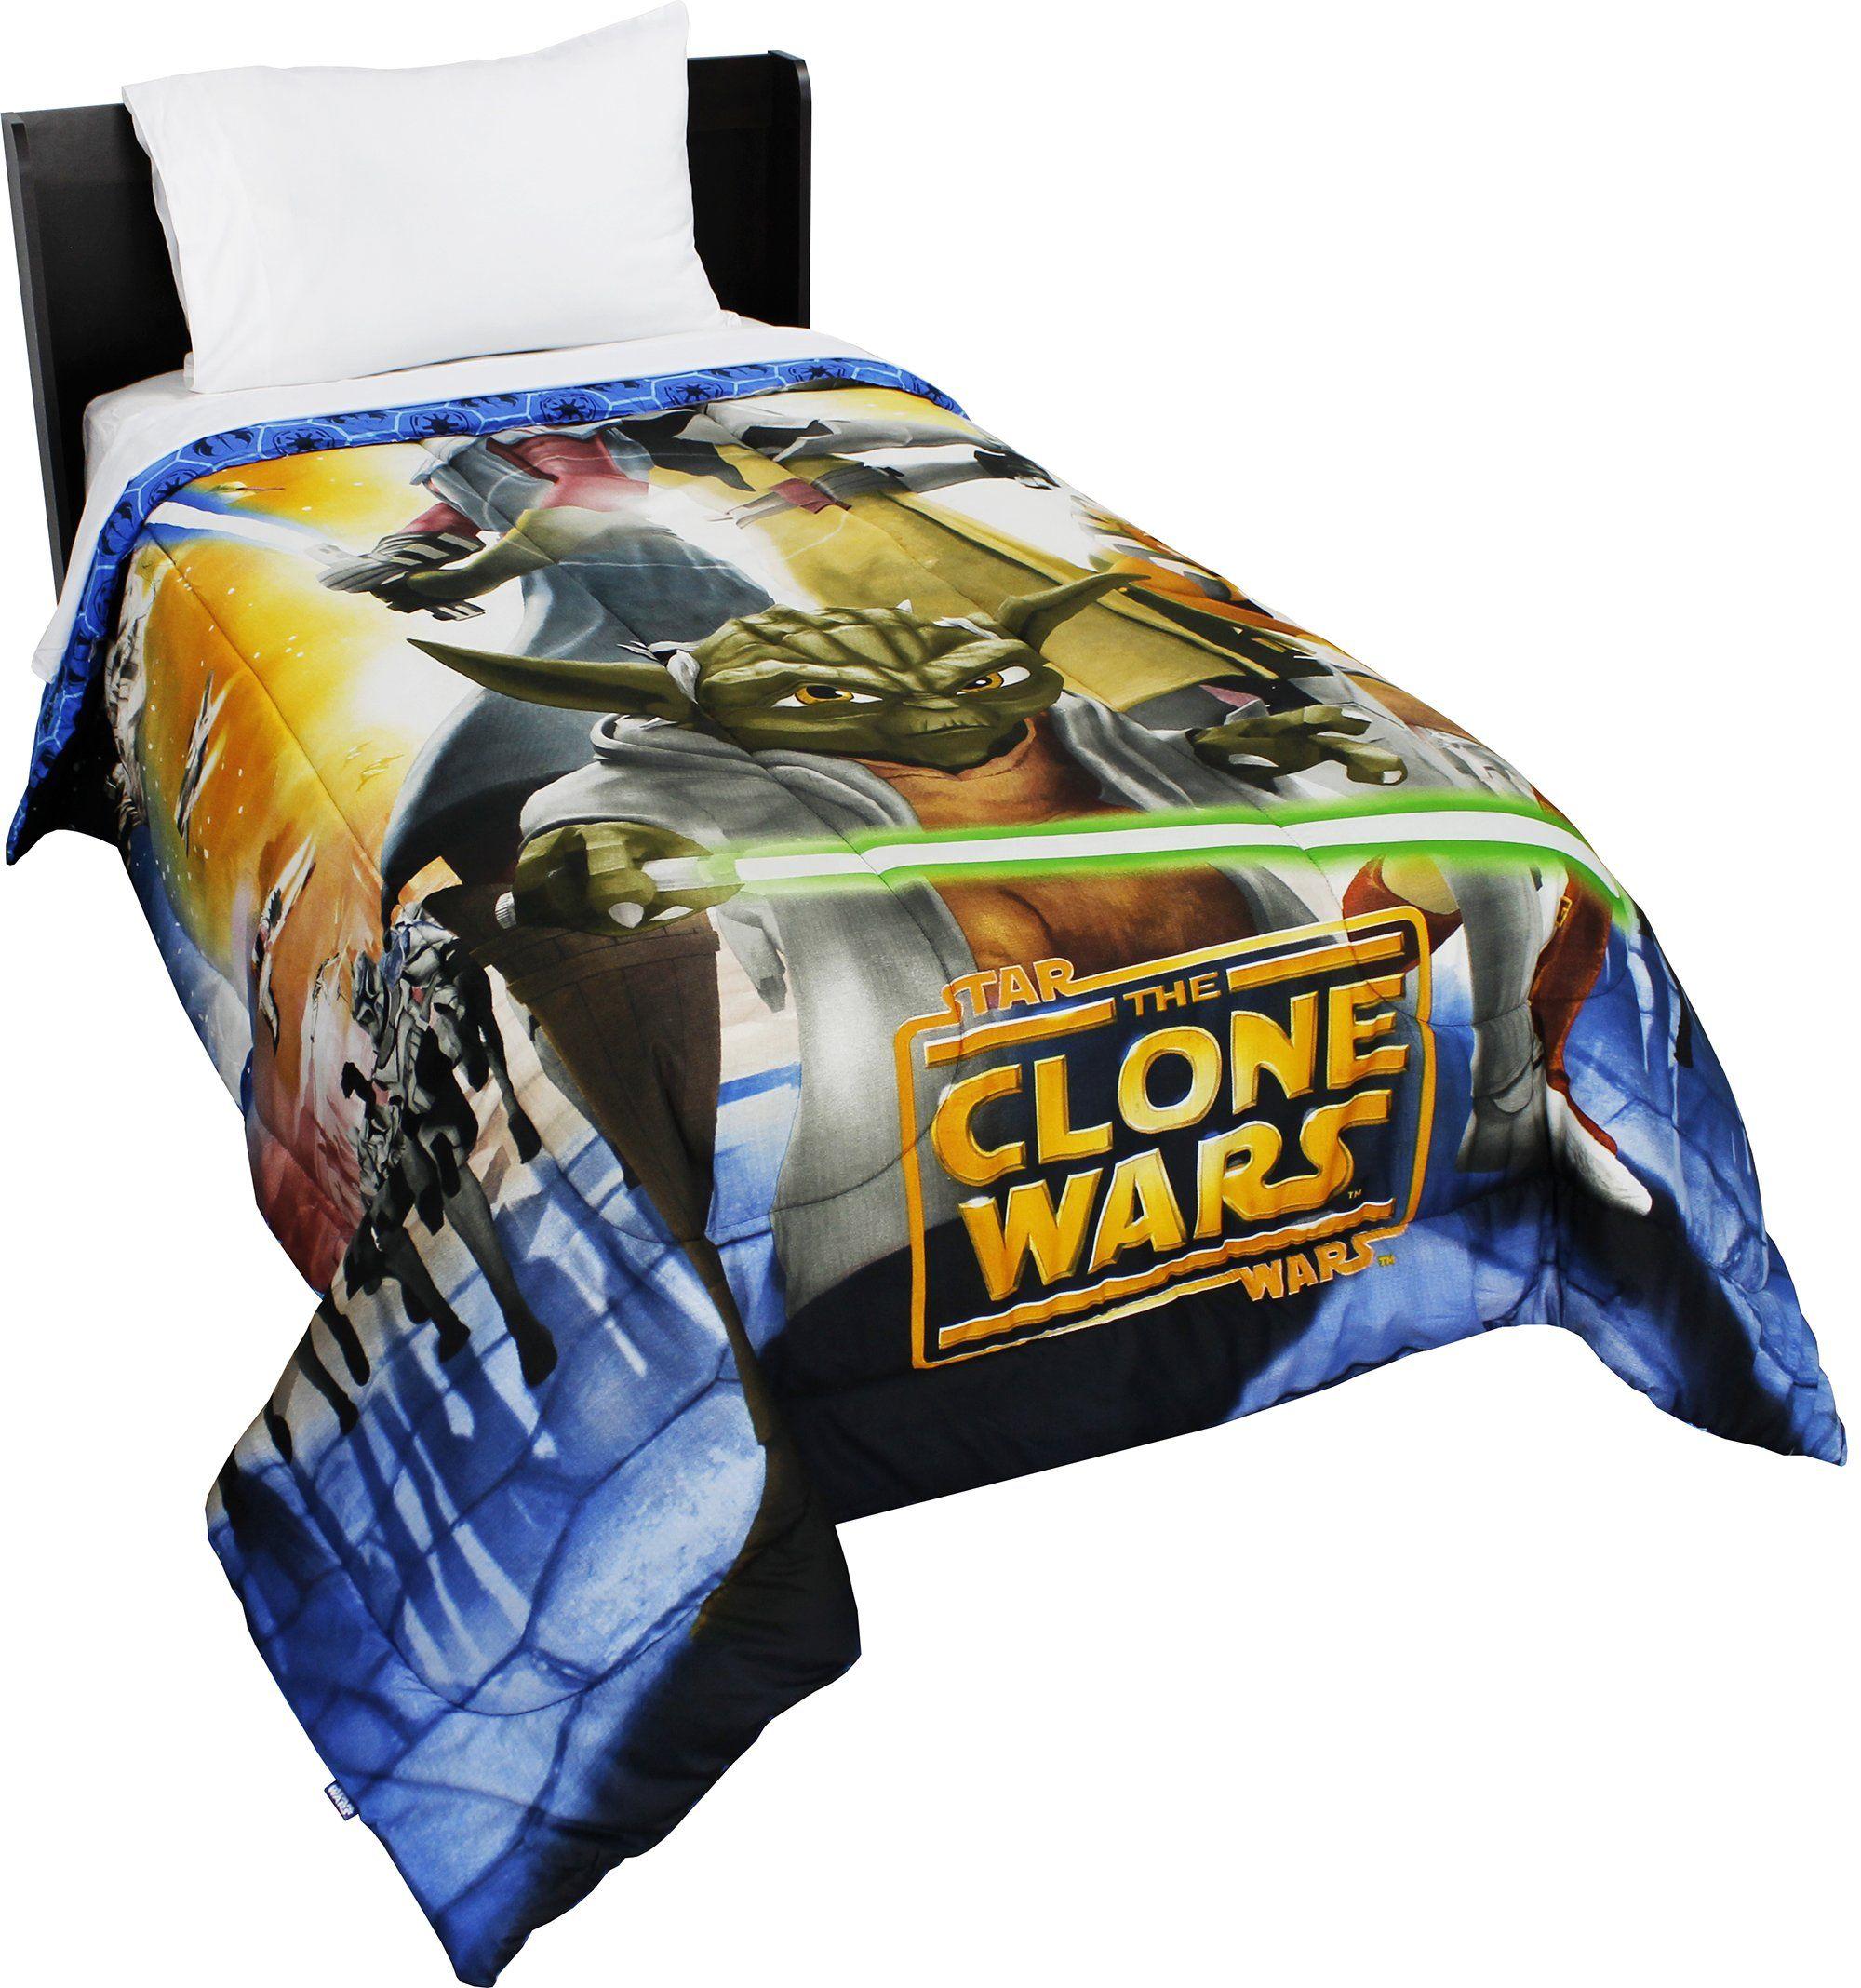 Star Wars Clone Wars Space Bed Comforter Star Wars Jedi Clone